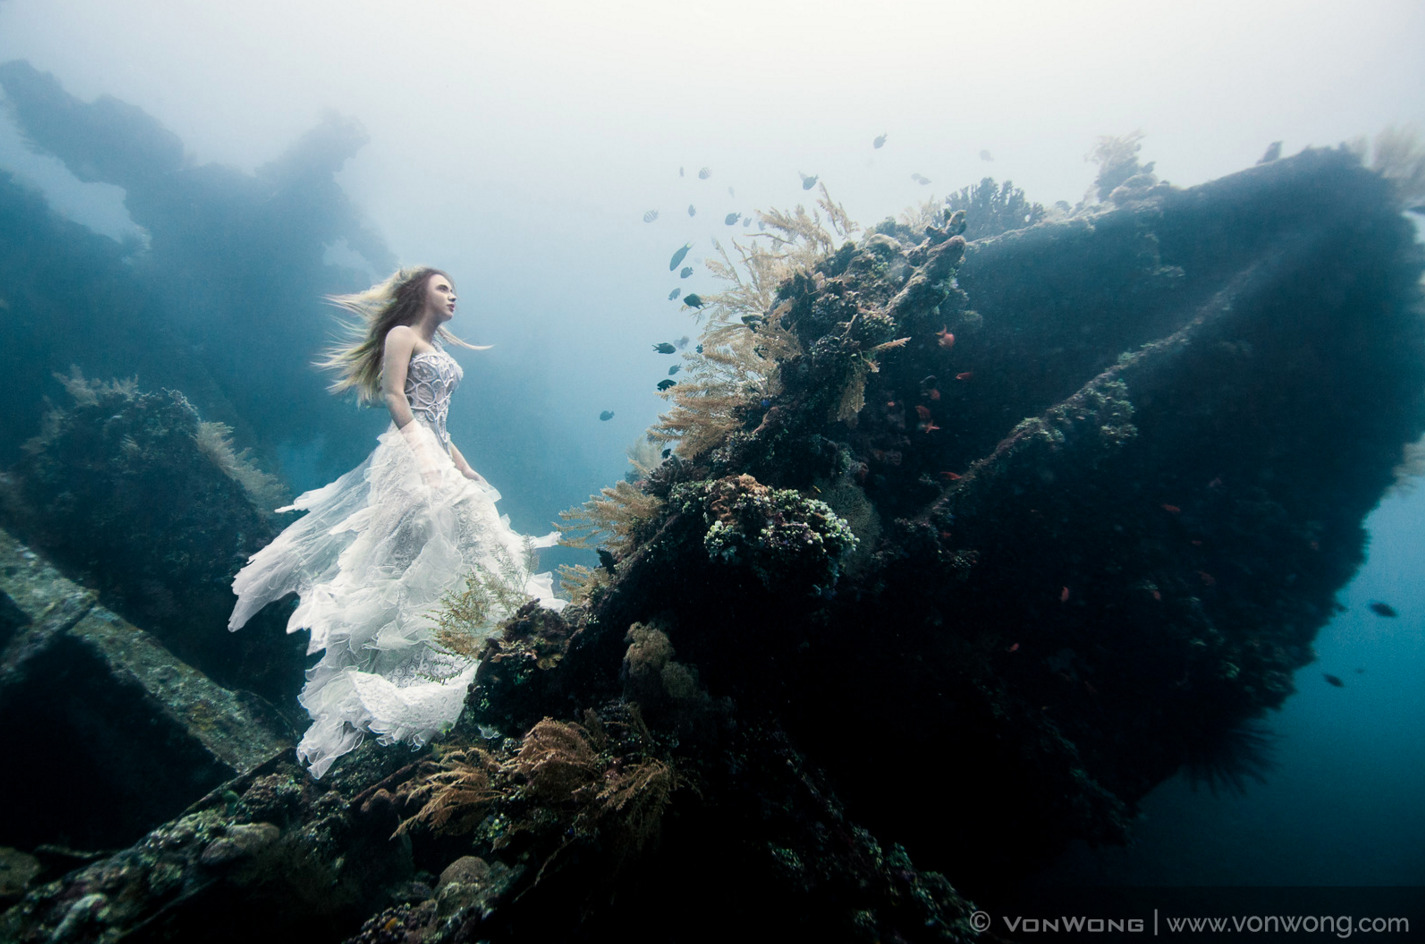 Фото под водой девушки 29 фотография